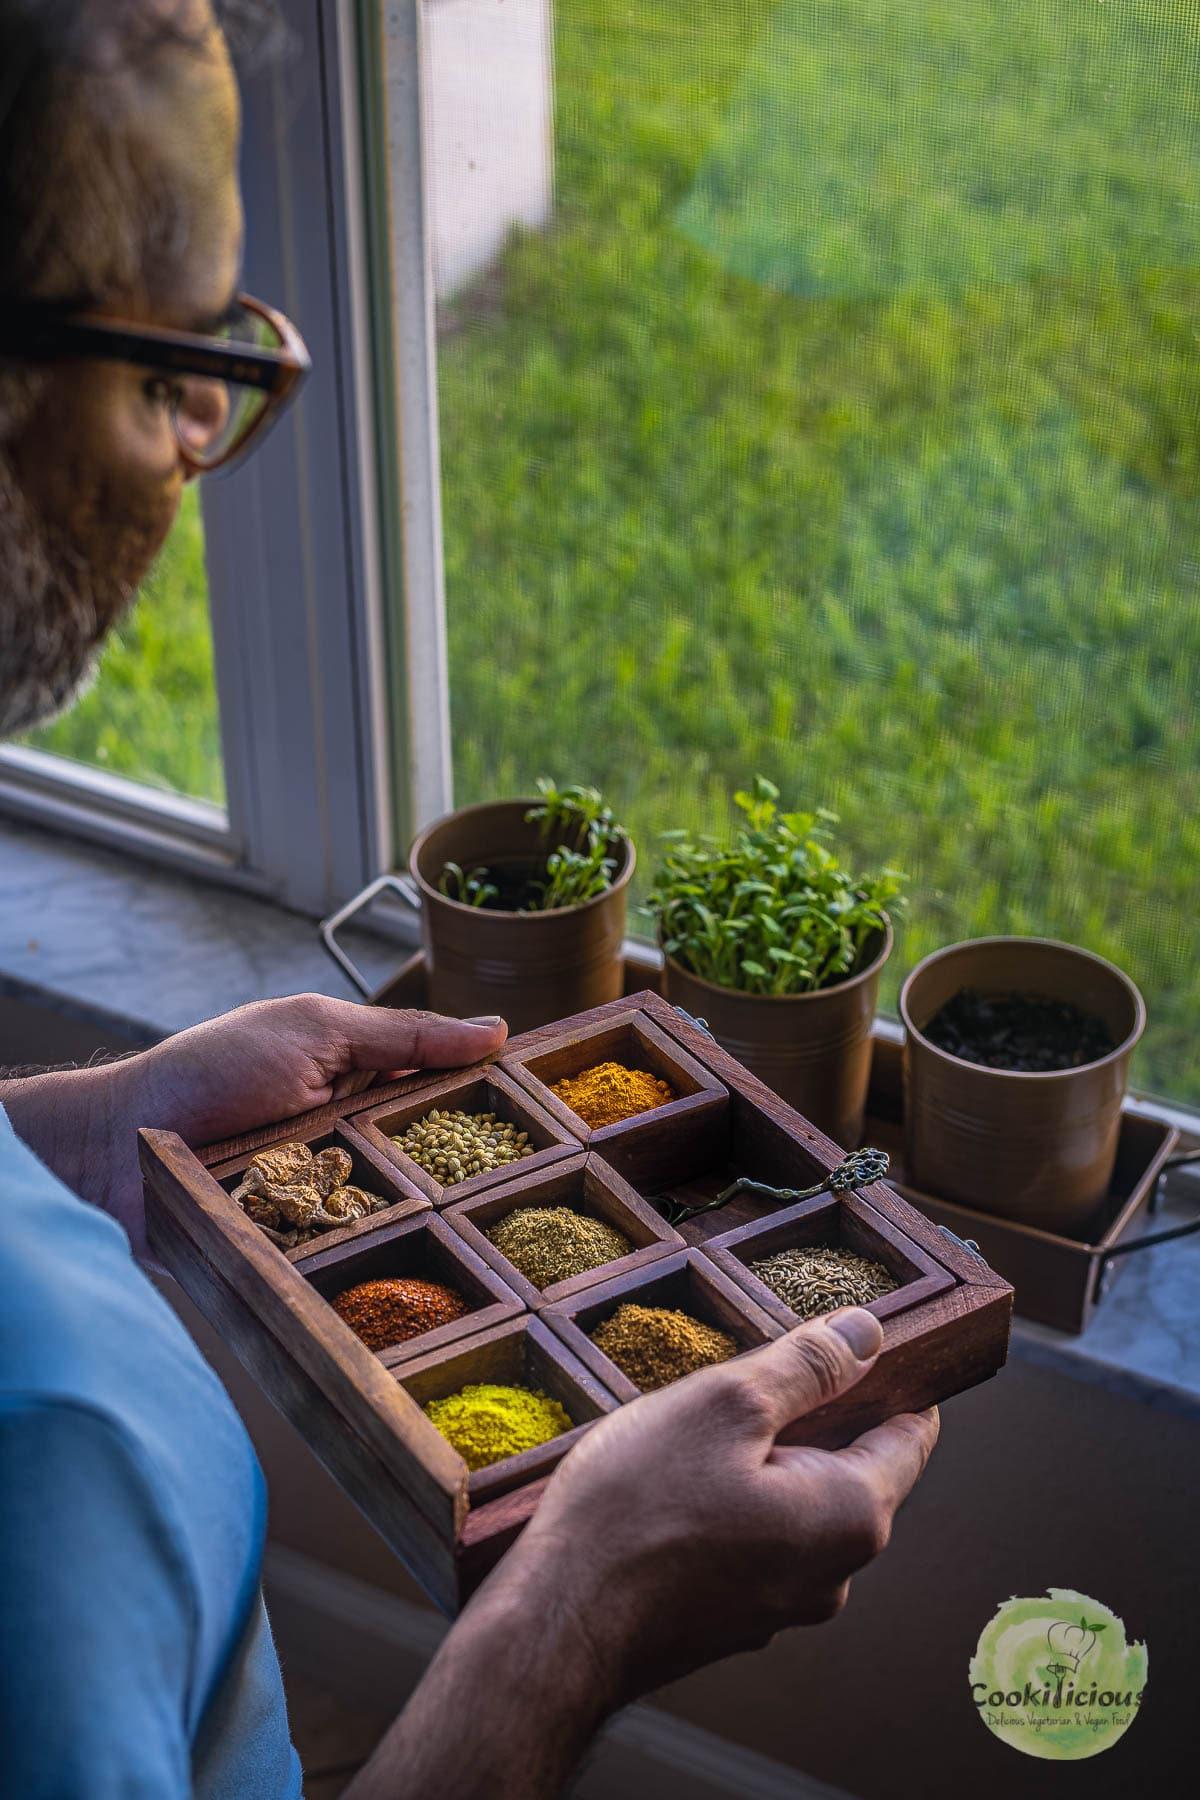 A man holding a spice box containing coriander cumin powder